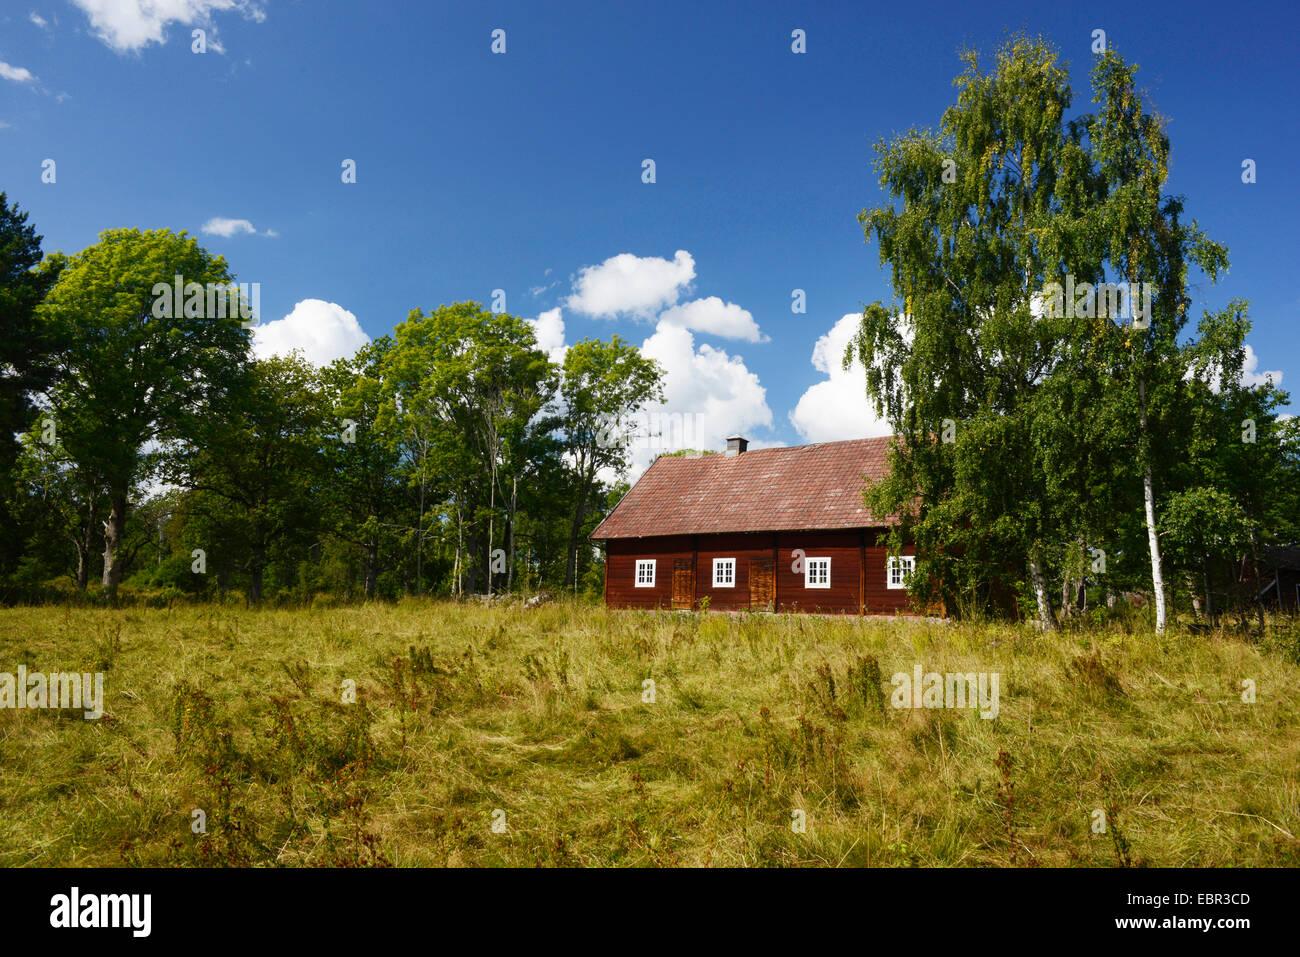 traditional swedish farm house, Sweden, Smaland - Stock Image